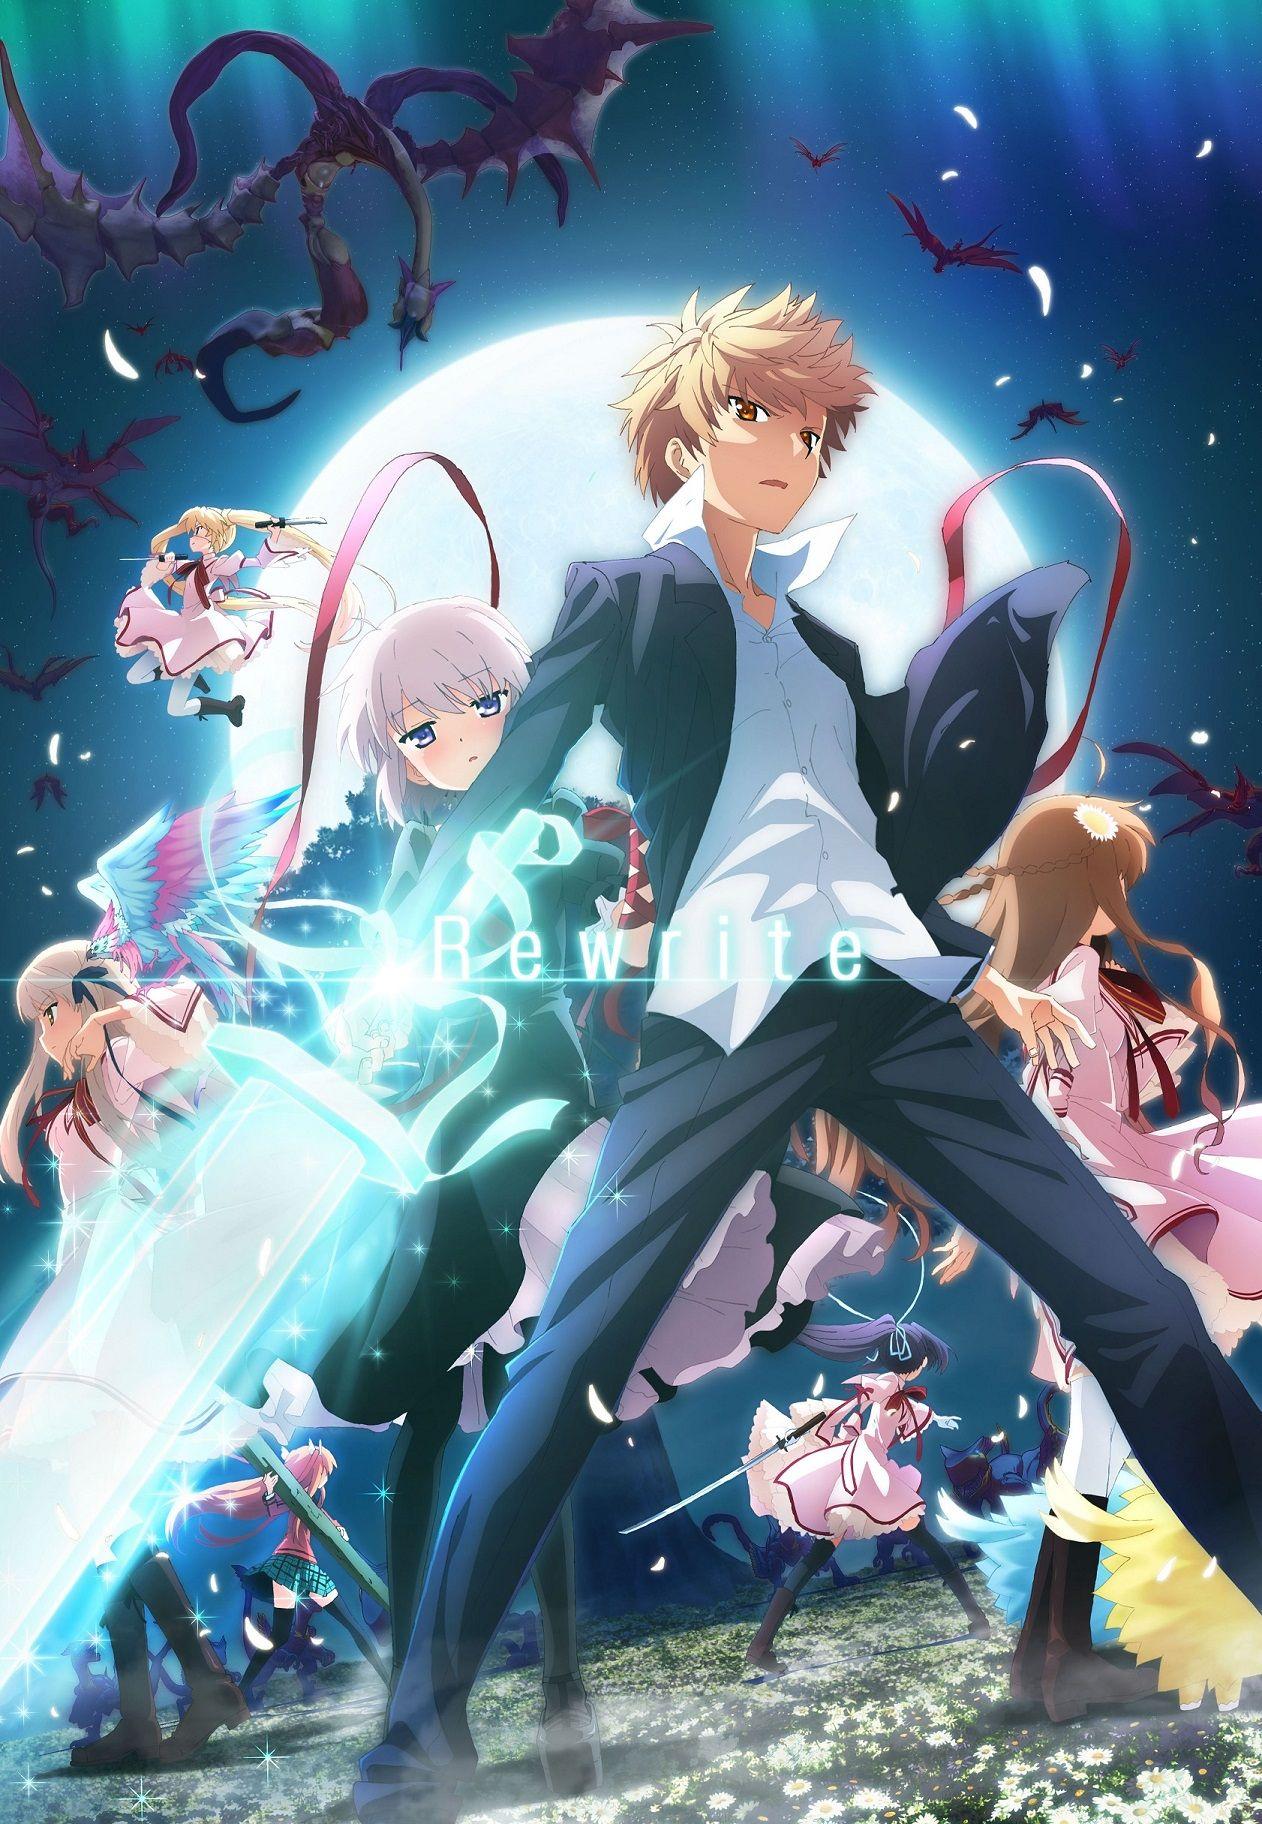 Tv Anime Rewrite Gets 2nd Season Anime Personagens De Anime